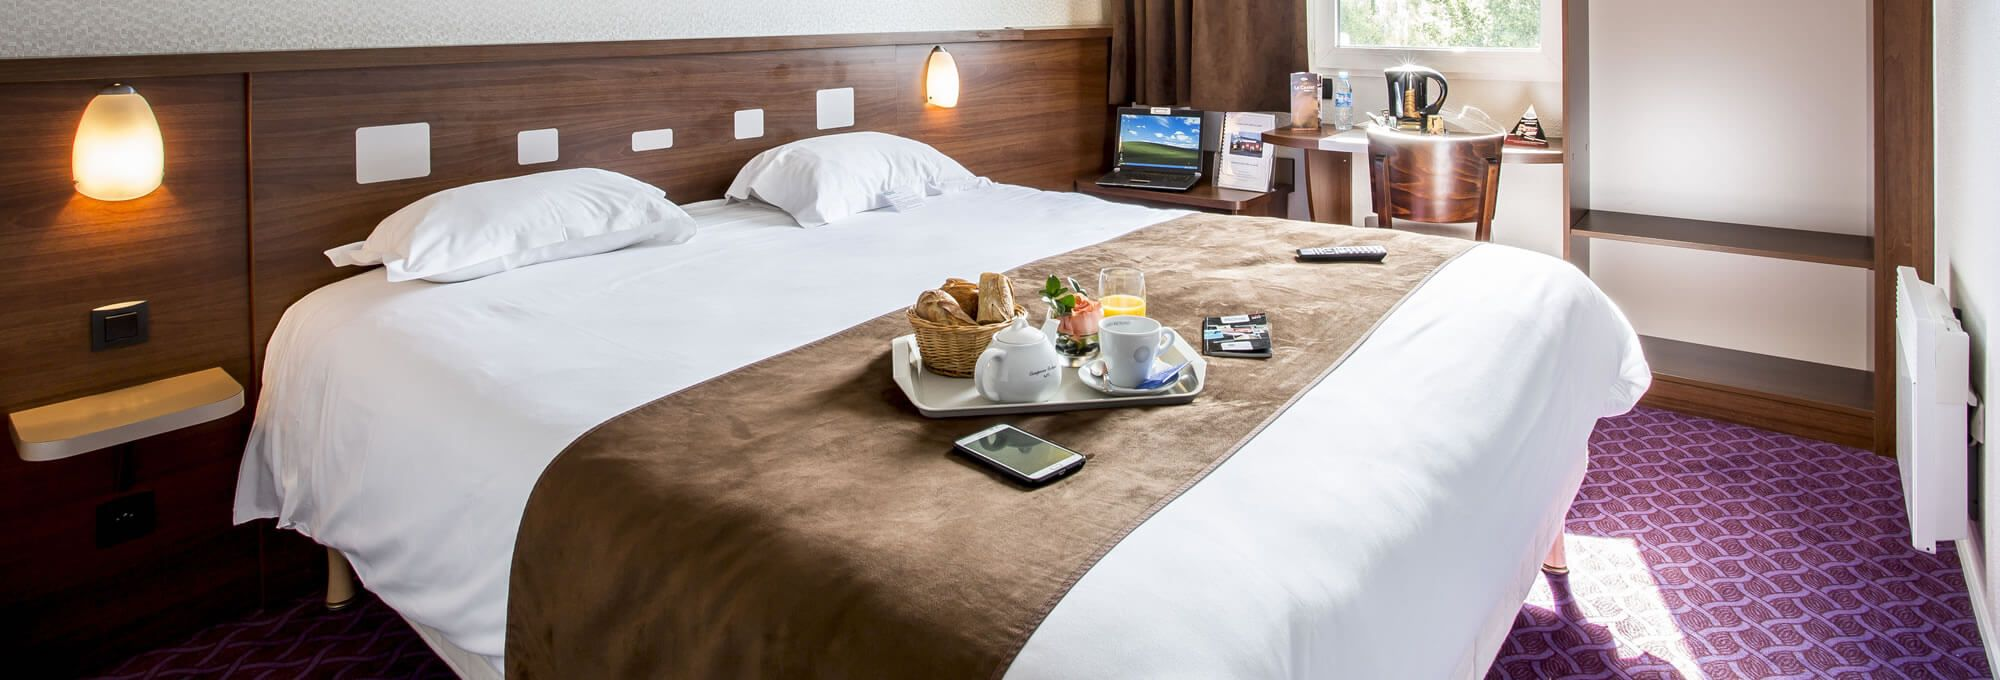 Hotel in Rennes three stars